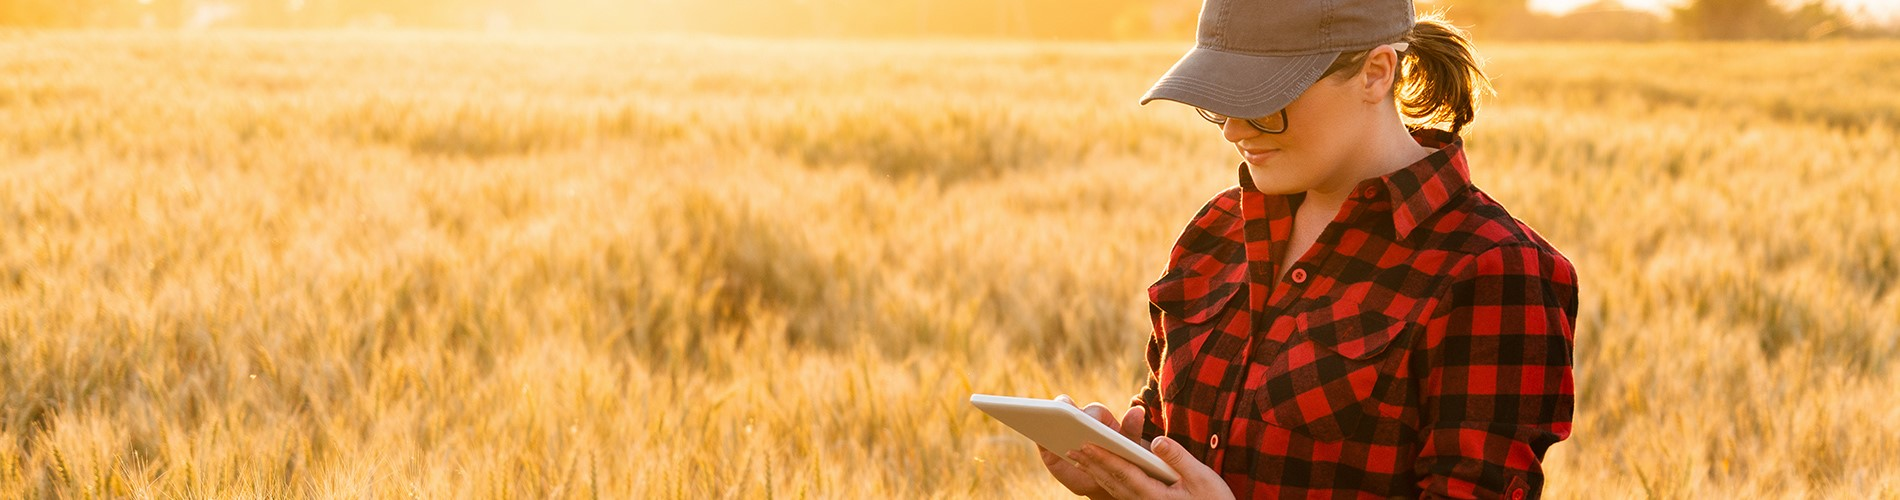 Alabama farmer banks on a mobile device